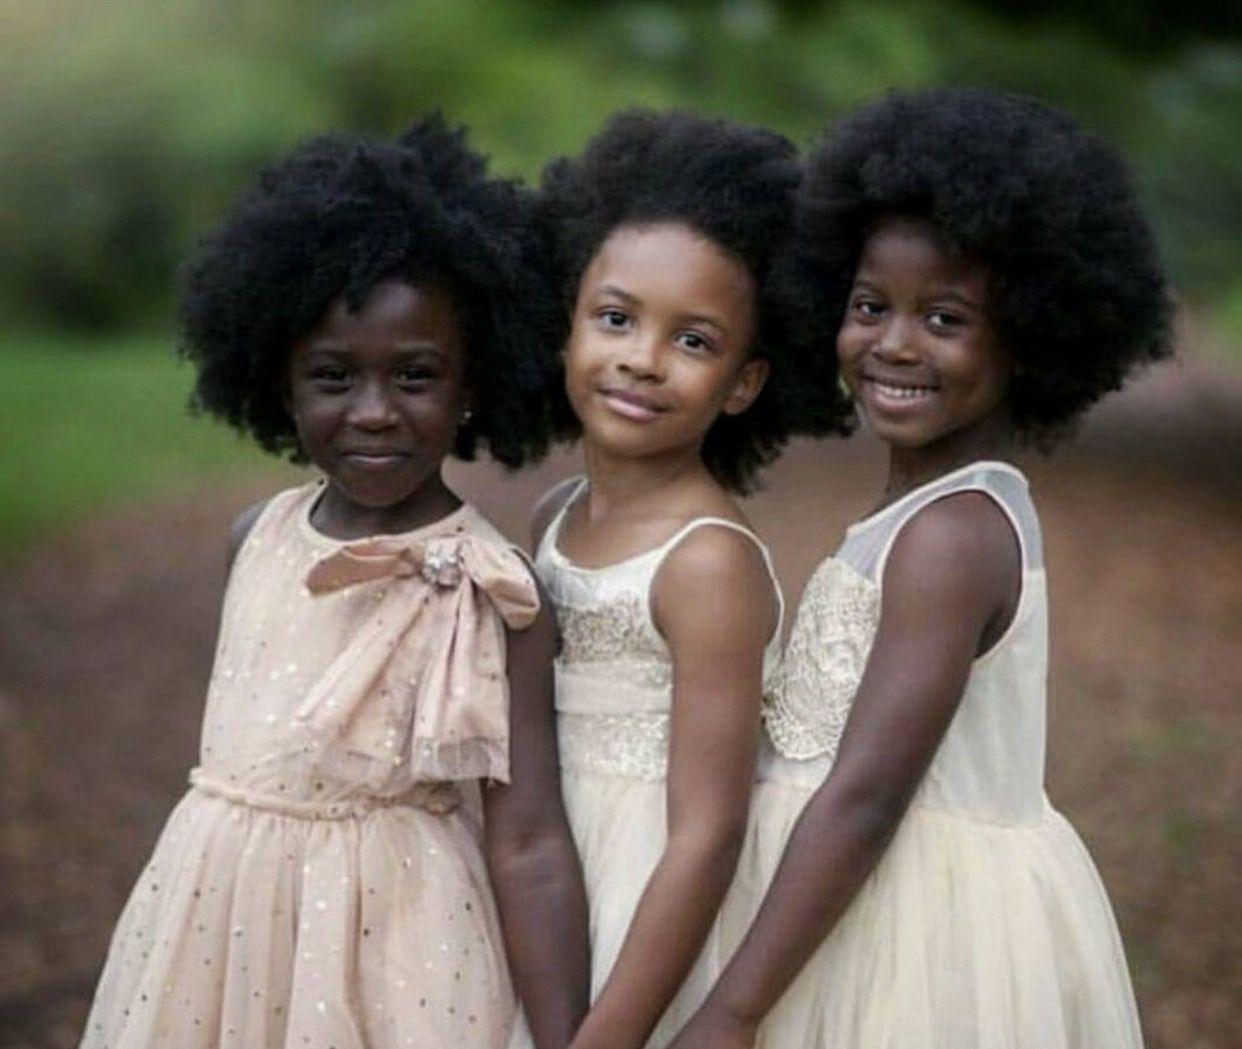 Tiny Teen African Girls Nude - Hot Nude-9275